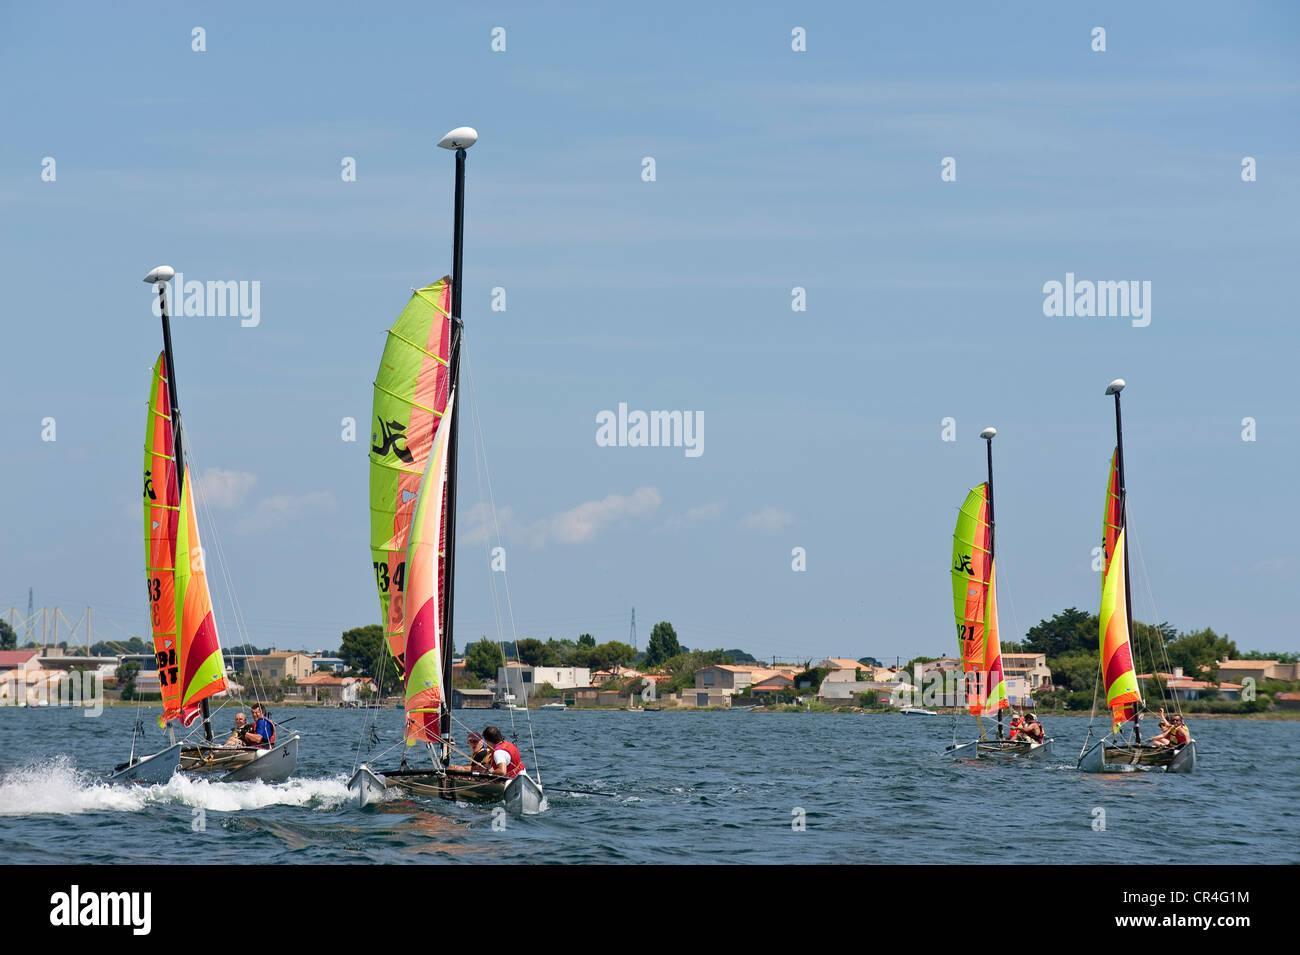 France, Herault, Sete, Bassin de Thau, Hobbies Cat, regatta of small sport catamarans - Stock Image